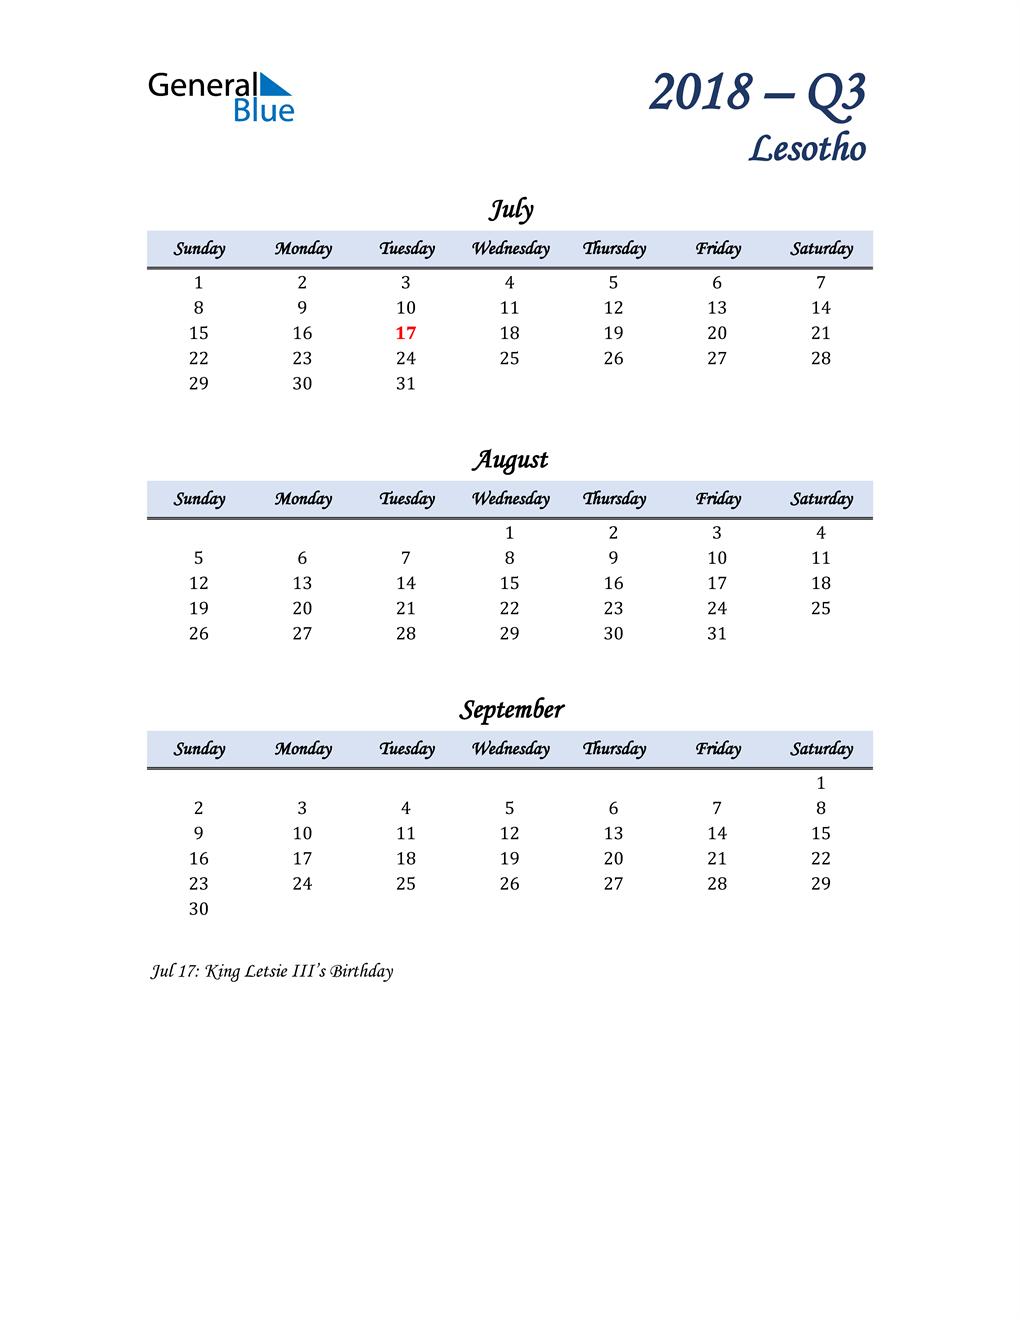 July, August, and September Calendar for Lesotho